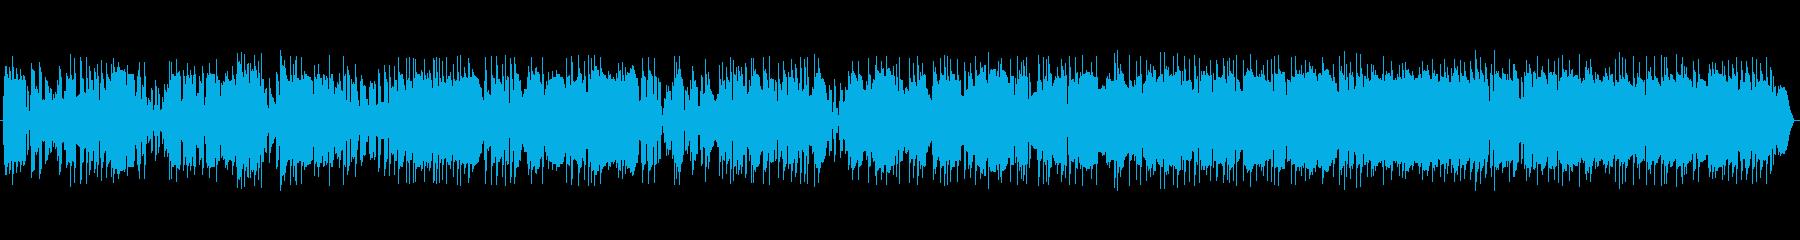 Retro Cerebellexコ...の再生済みの波形